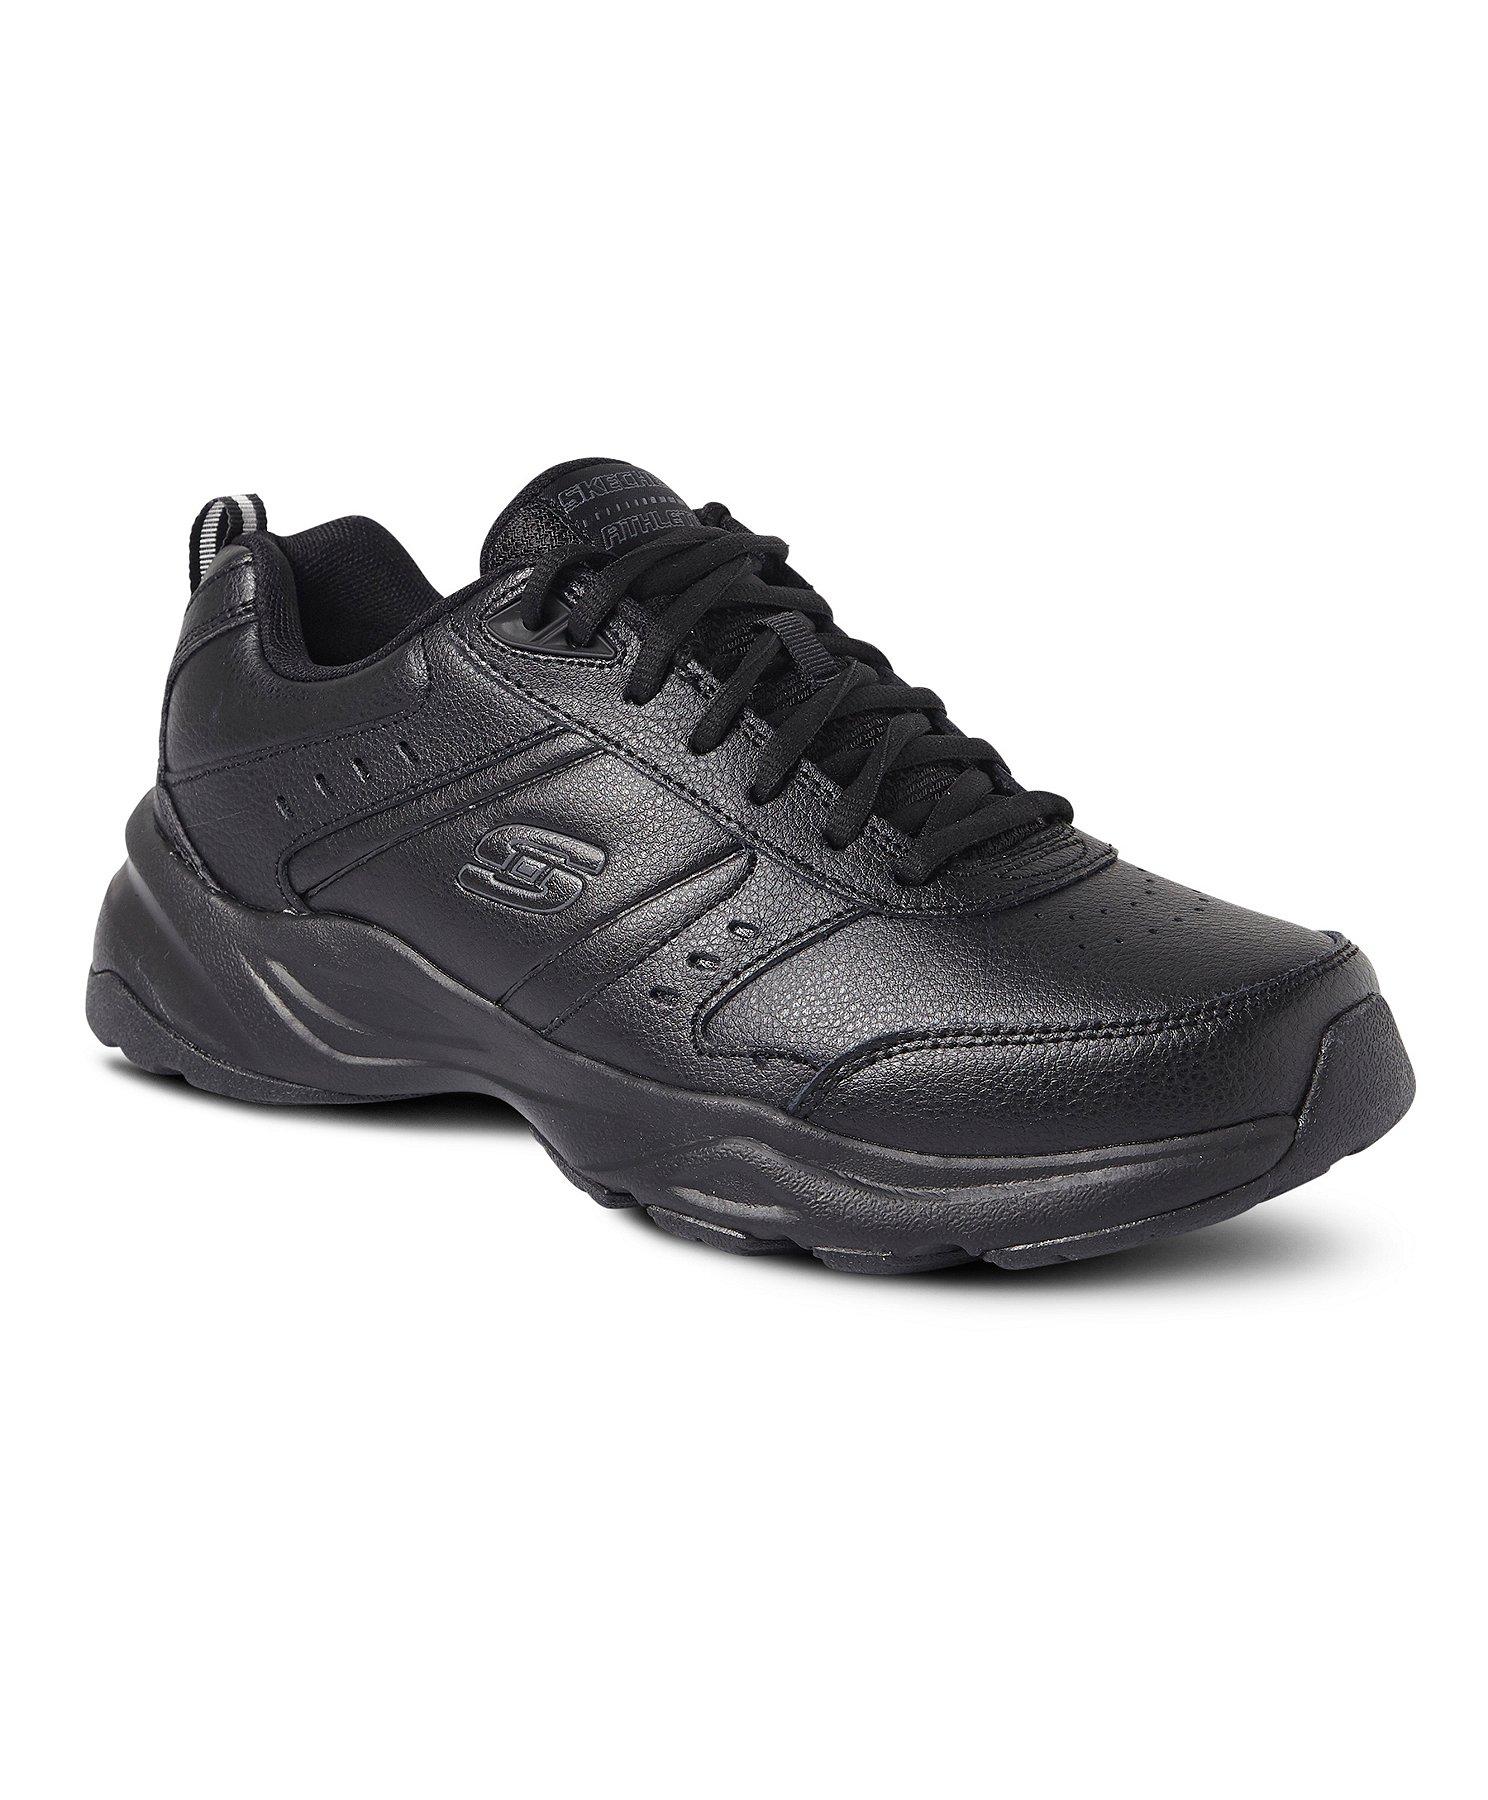 bufanda Específico Se asemeja  Men's Haniger Sneakers   Mark's